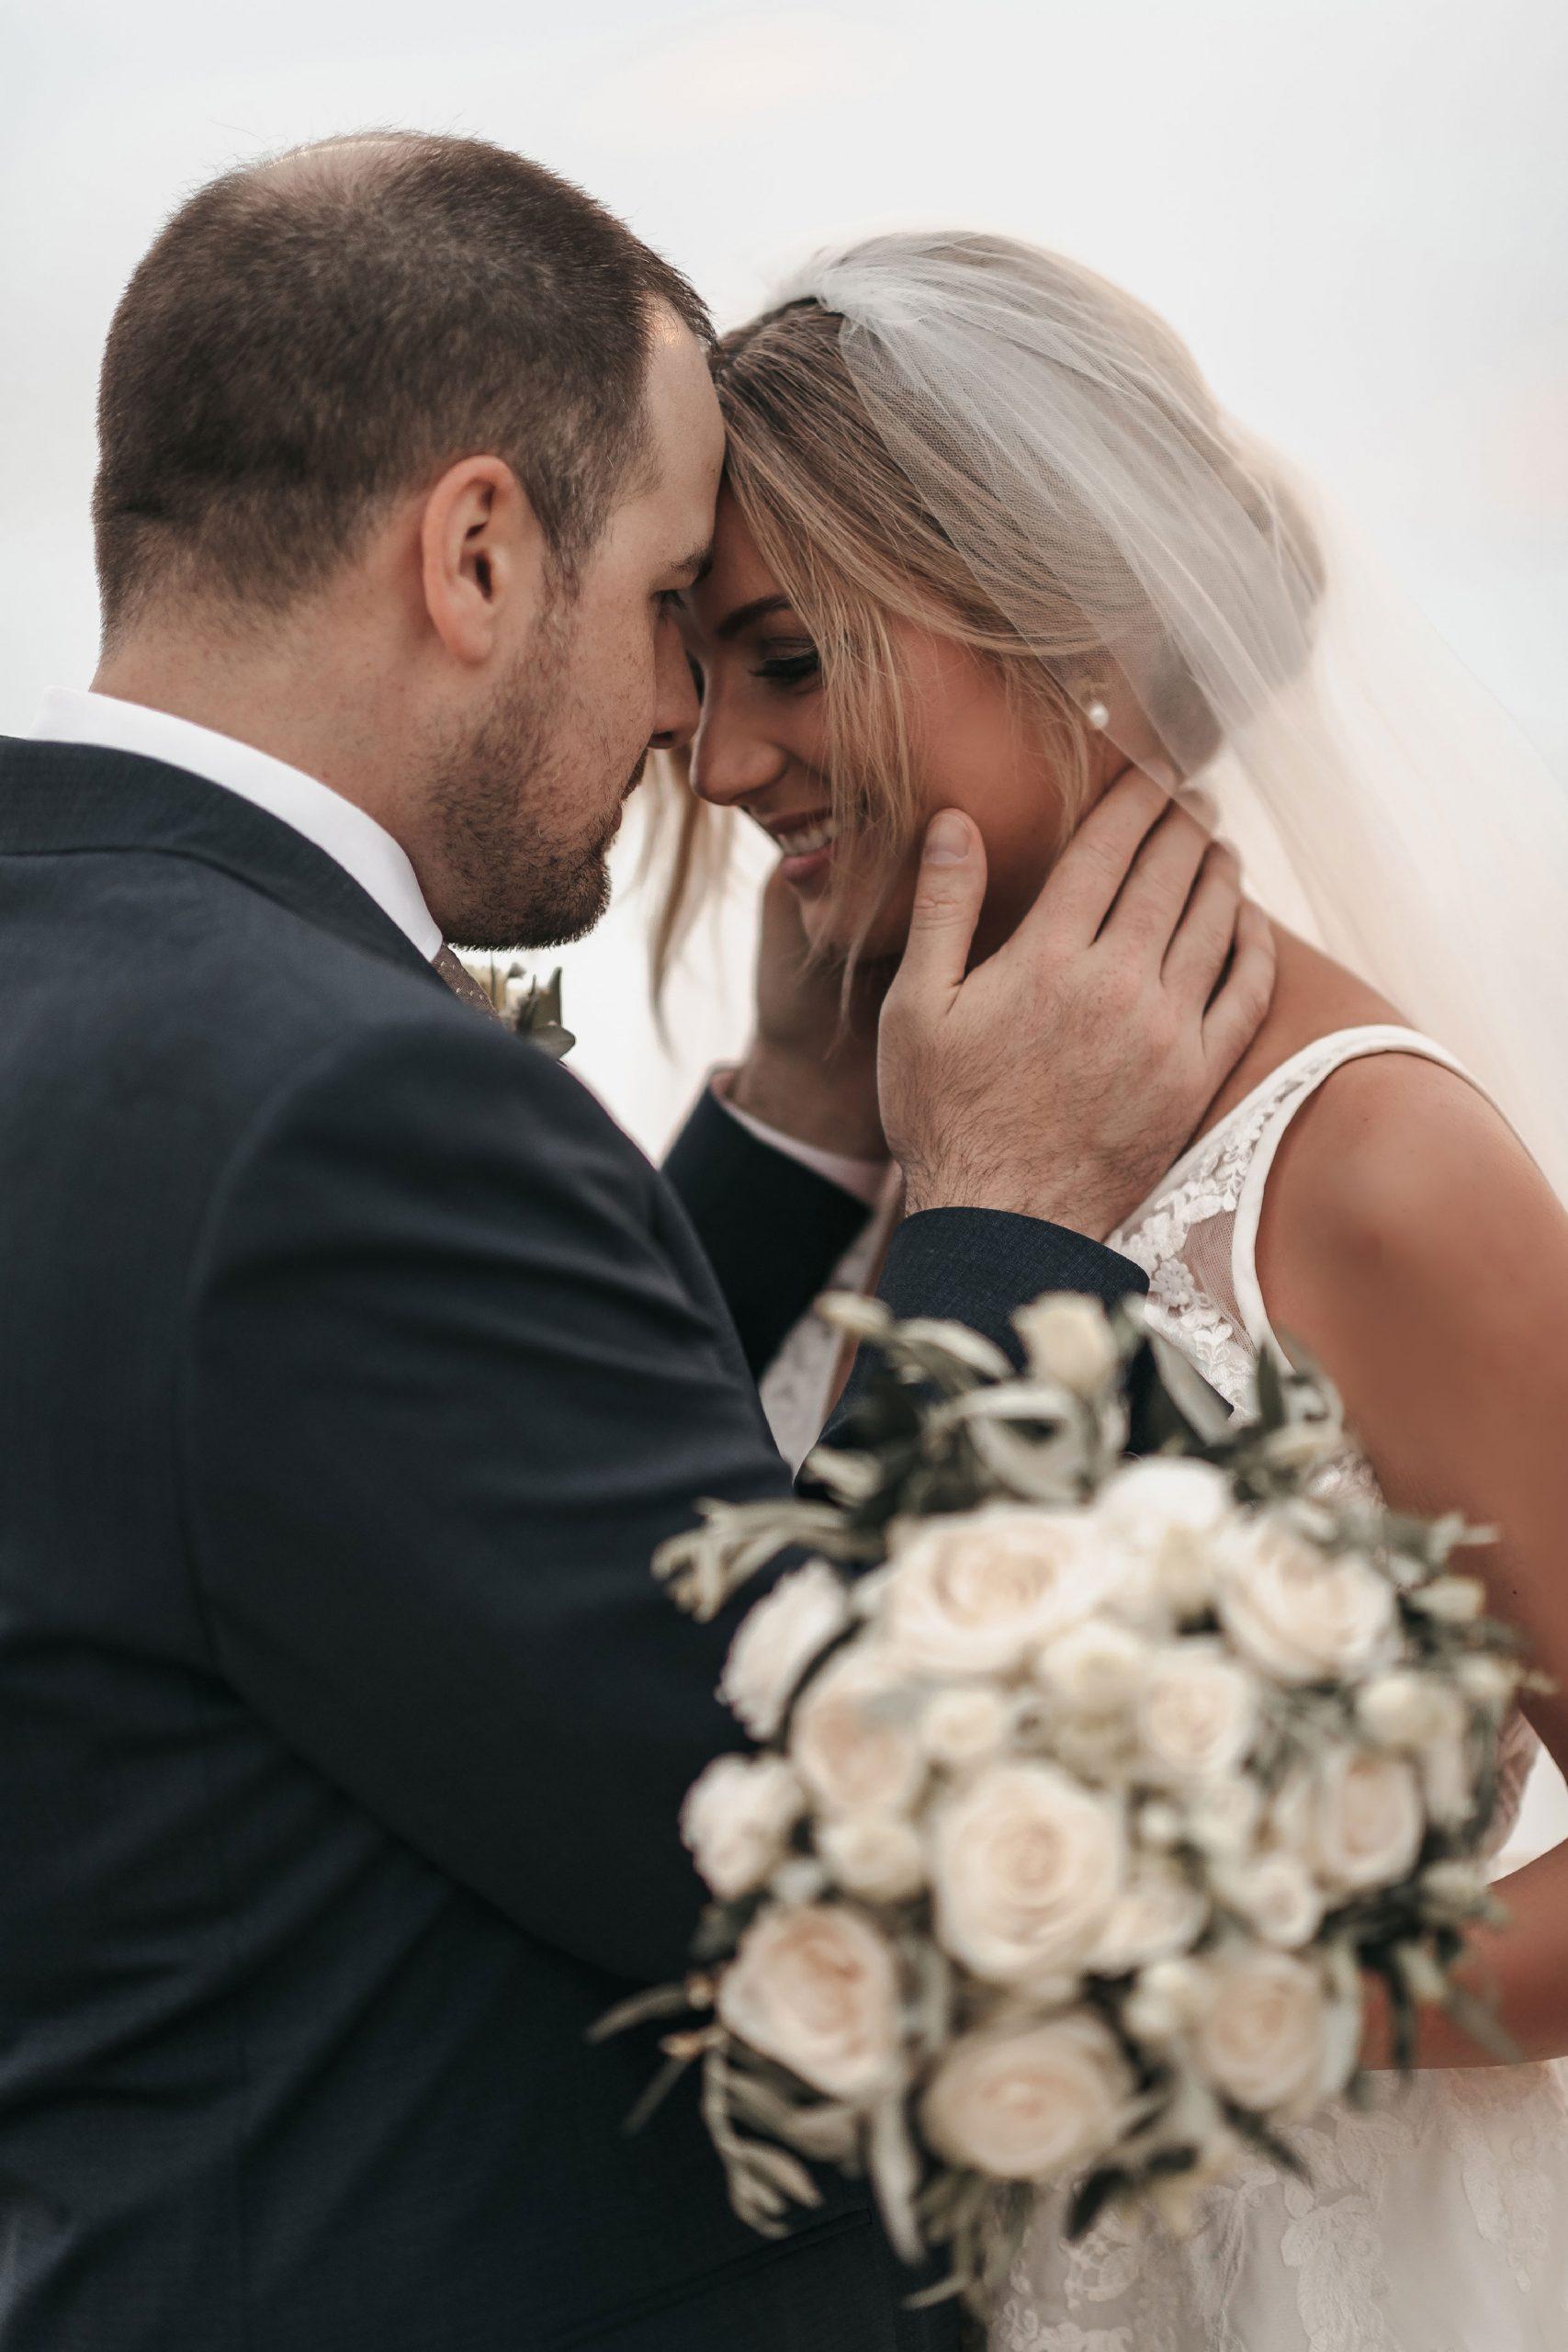 Bride and groom's wedding portrait photos